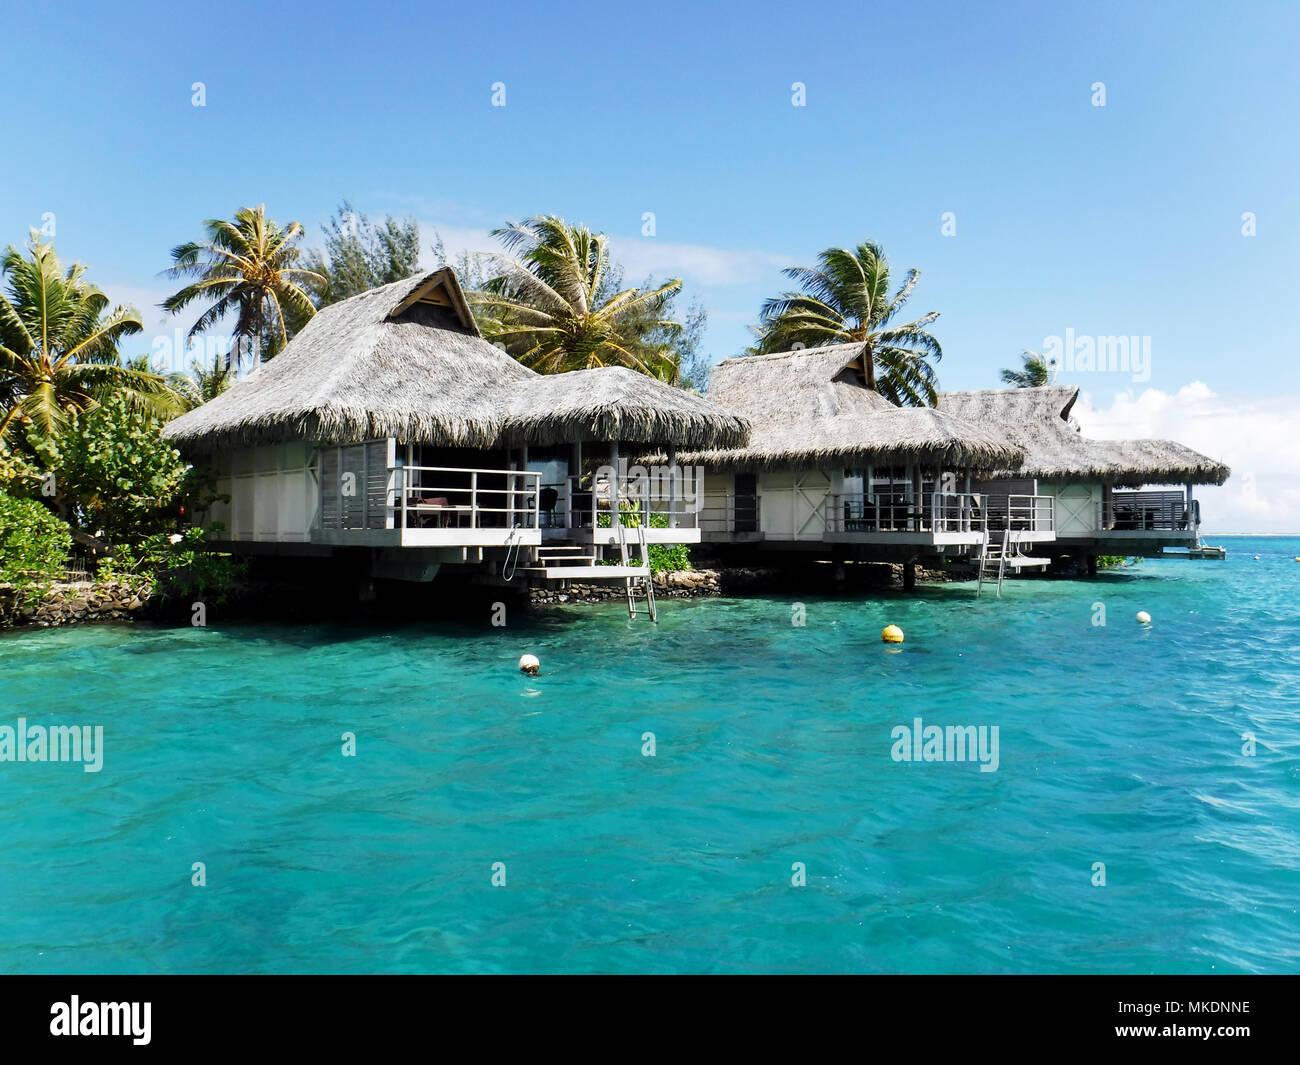 Water bungalows over ocean. Moorea, Tahiti Polynesia - Stock Image